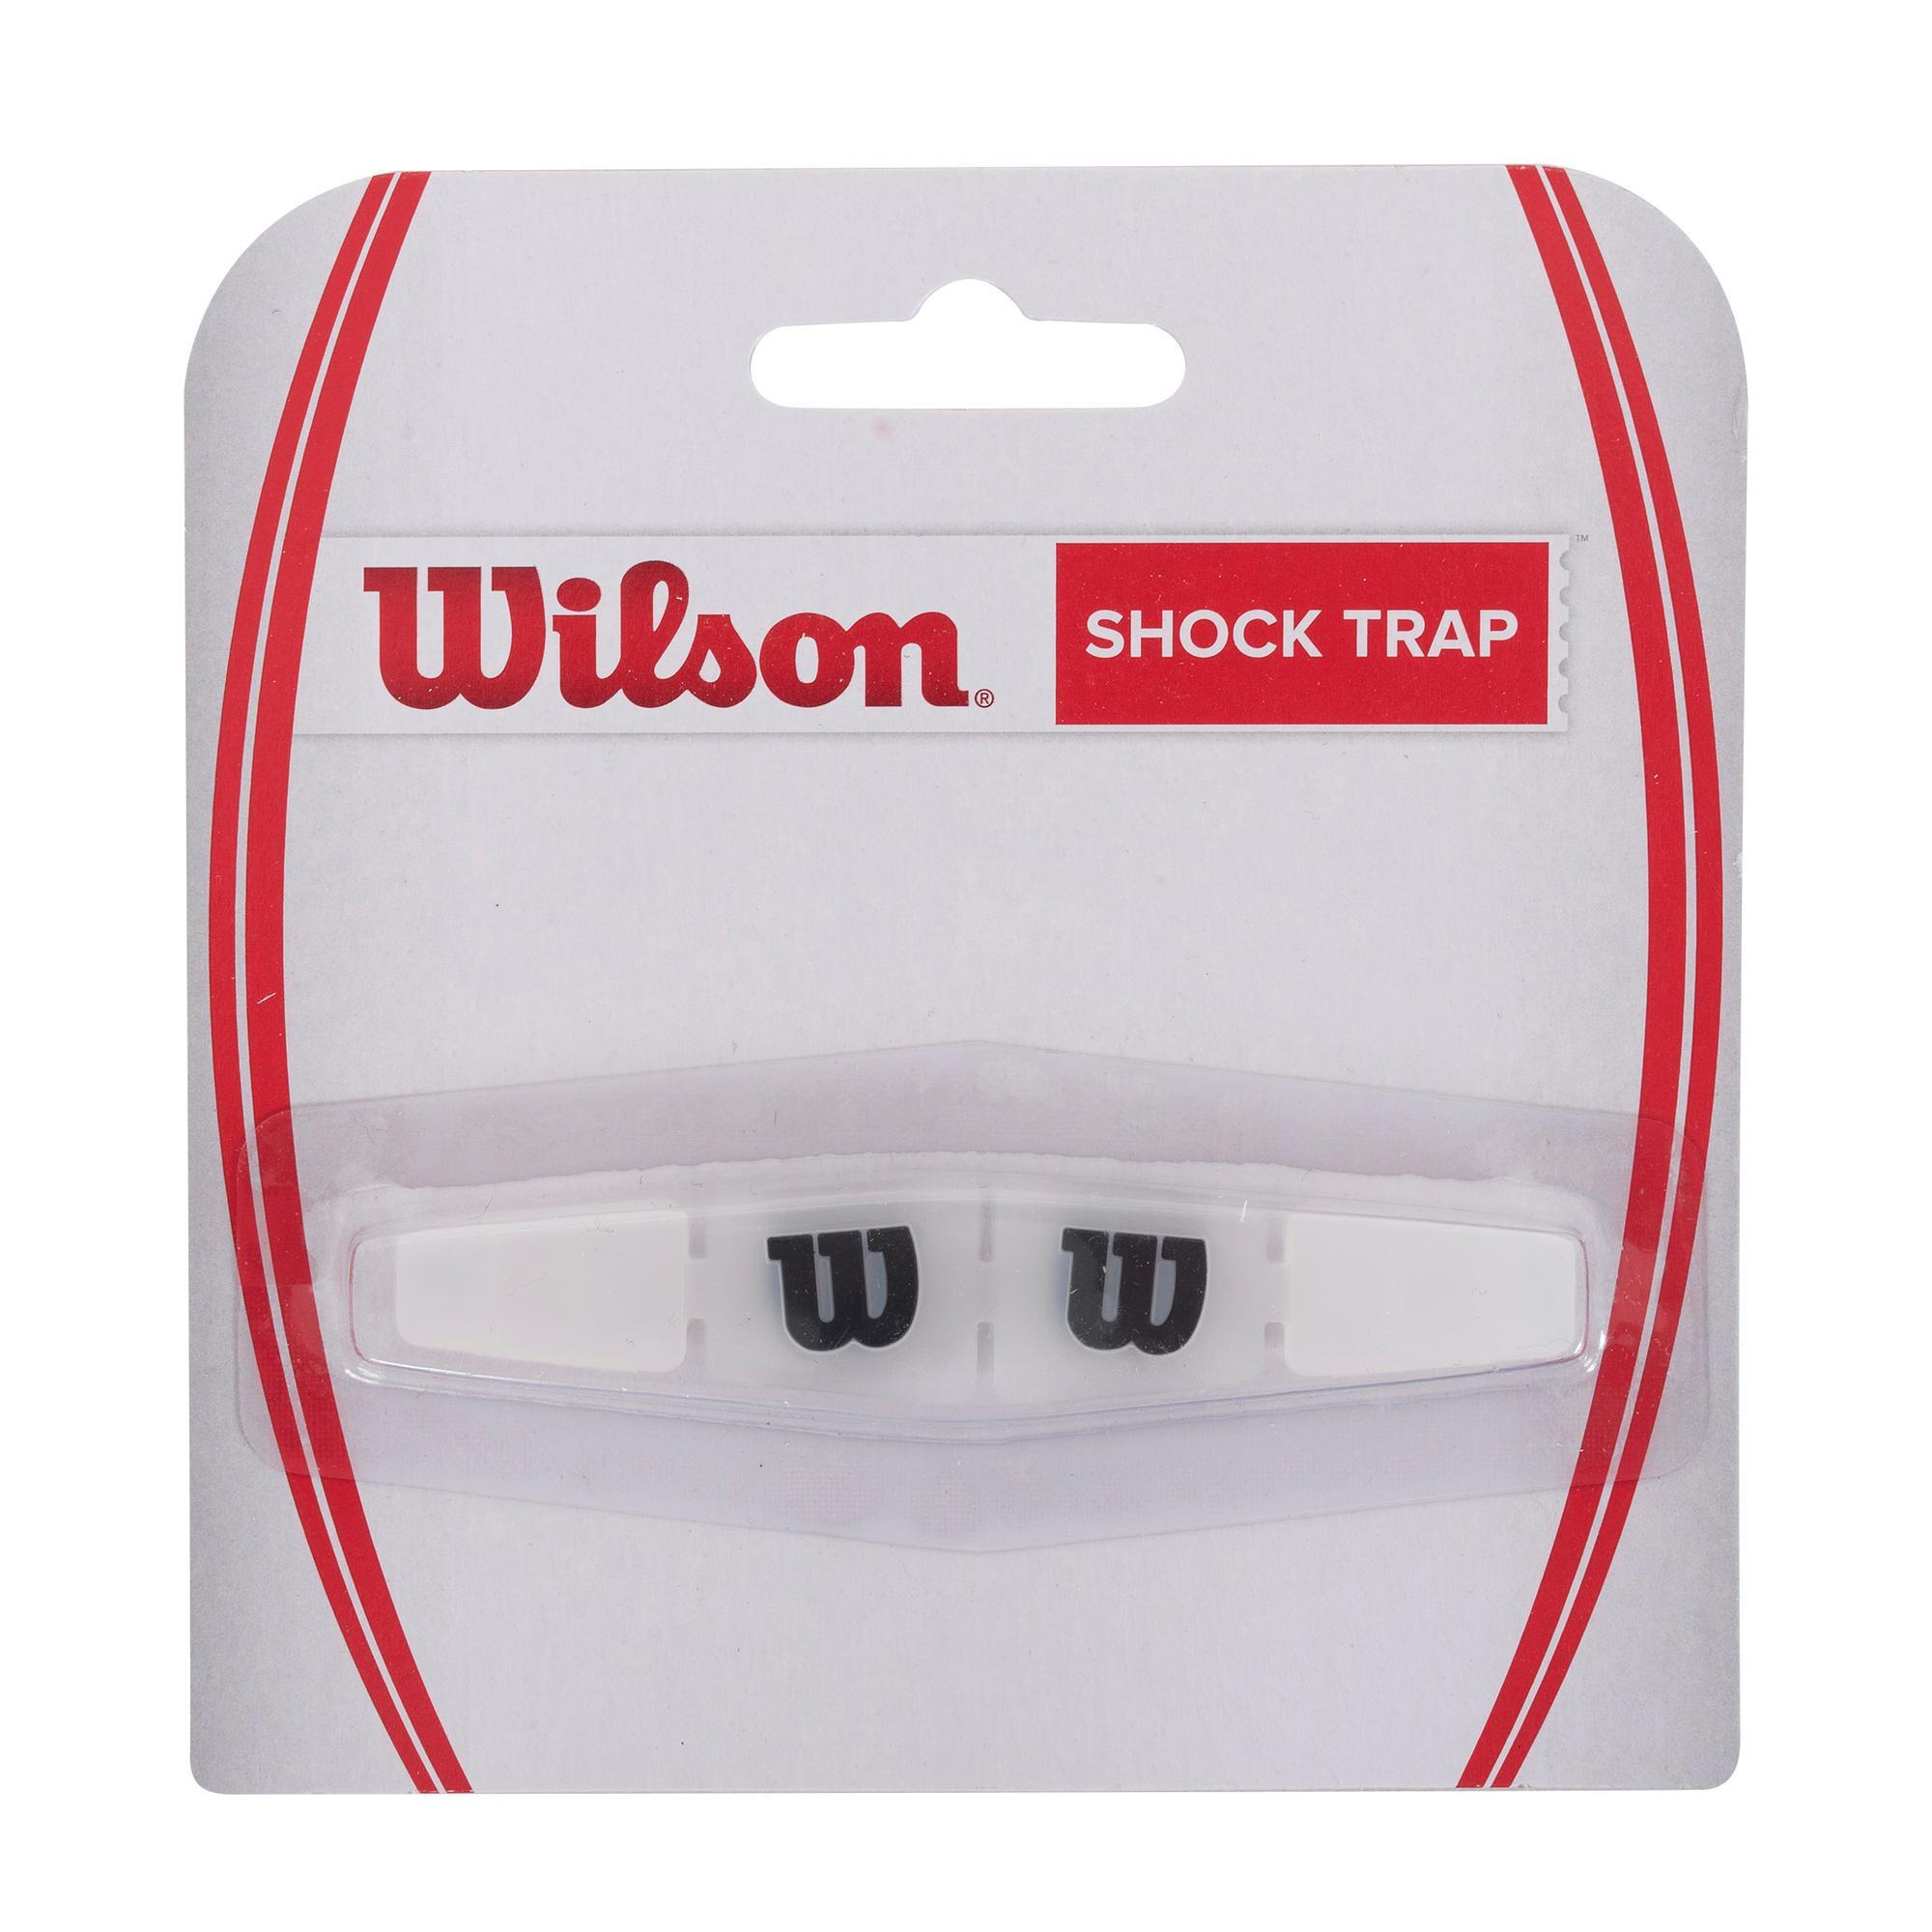 Wilson Trillingdemper Shock Trap wit kopen